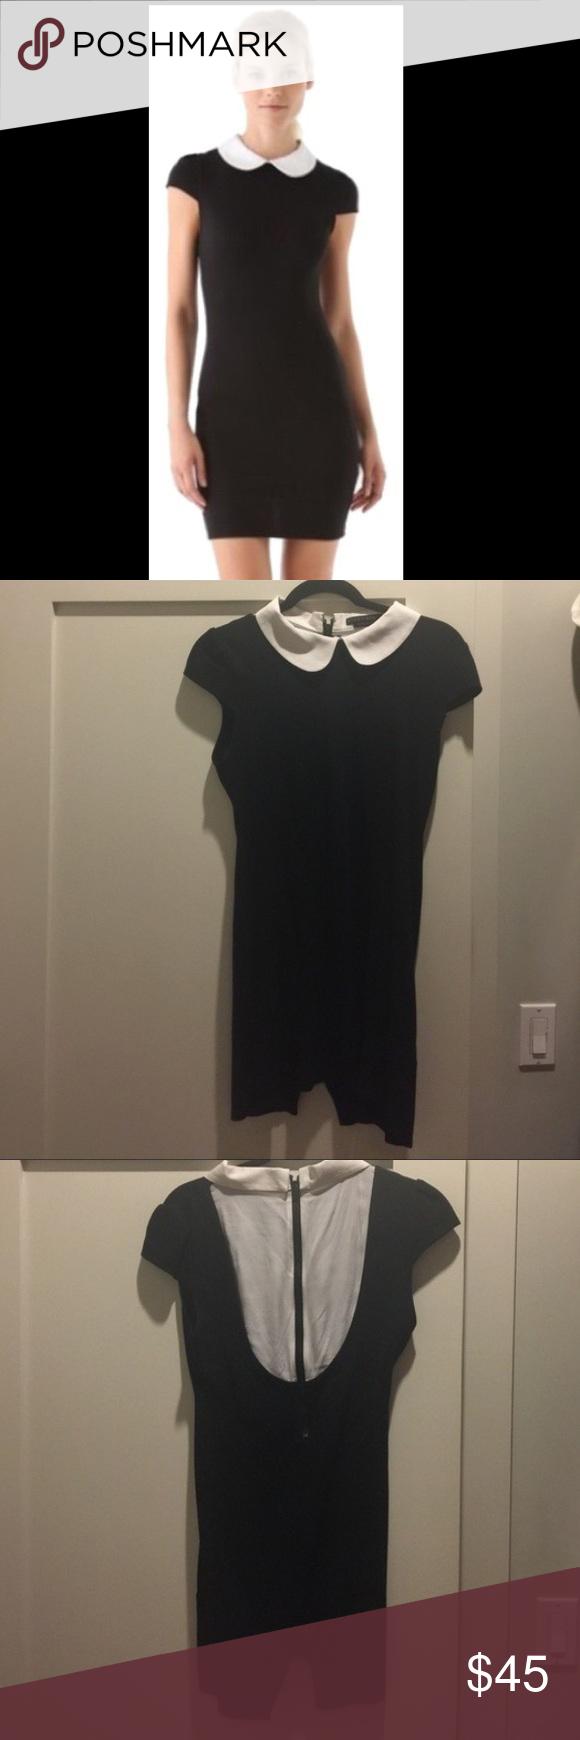 Alice Olivia Black Sweater Dress White Dress 8 Cute black sweater ...